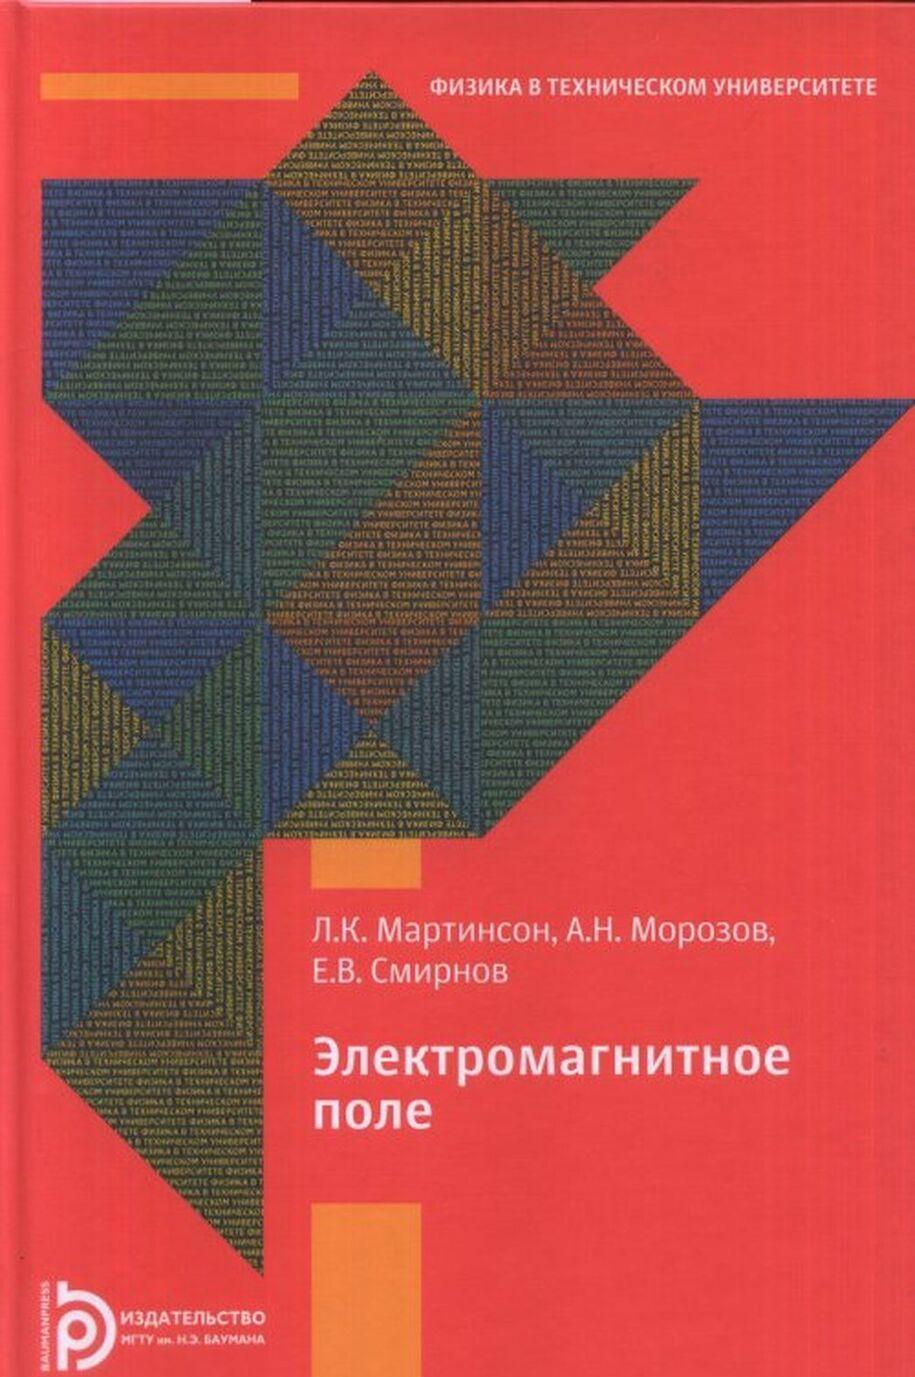 Elektromagnitnoe pole. Uchebnoe posobie | Martinson Leonid Karlovich, Smirnov Evgenij Vasilevich